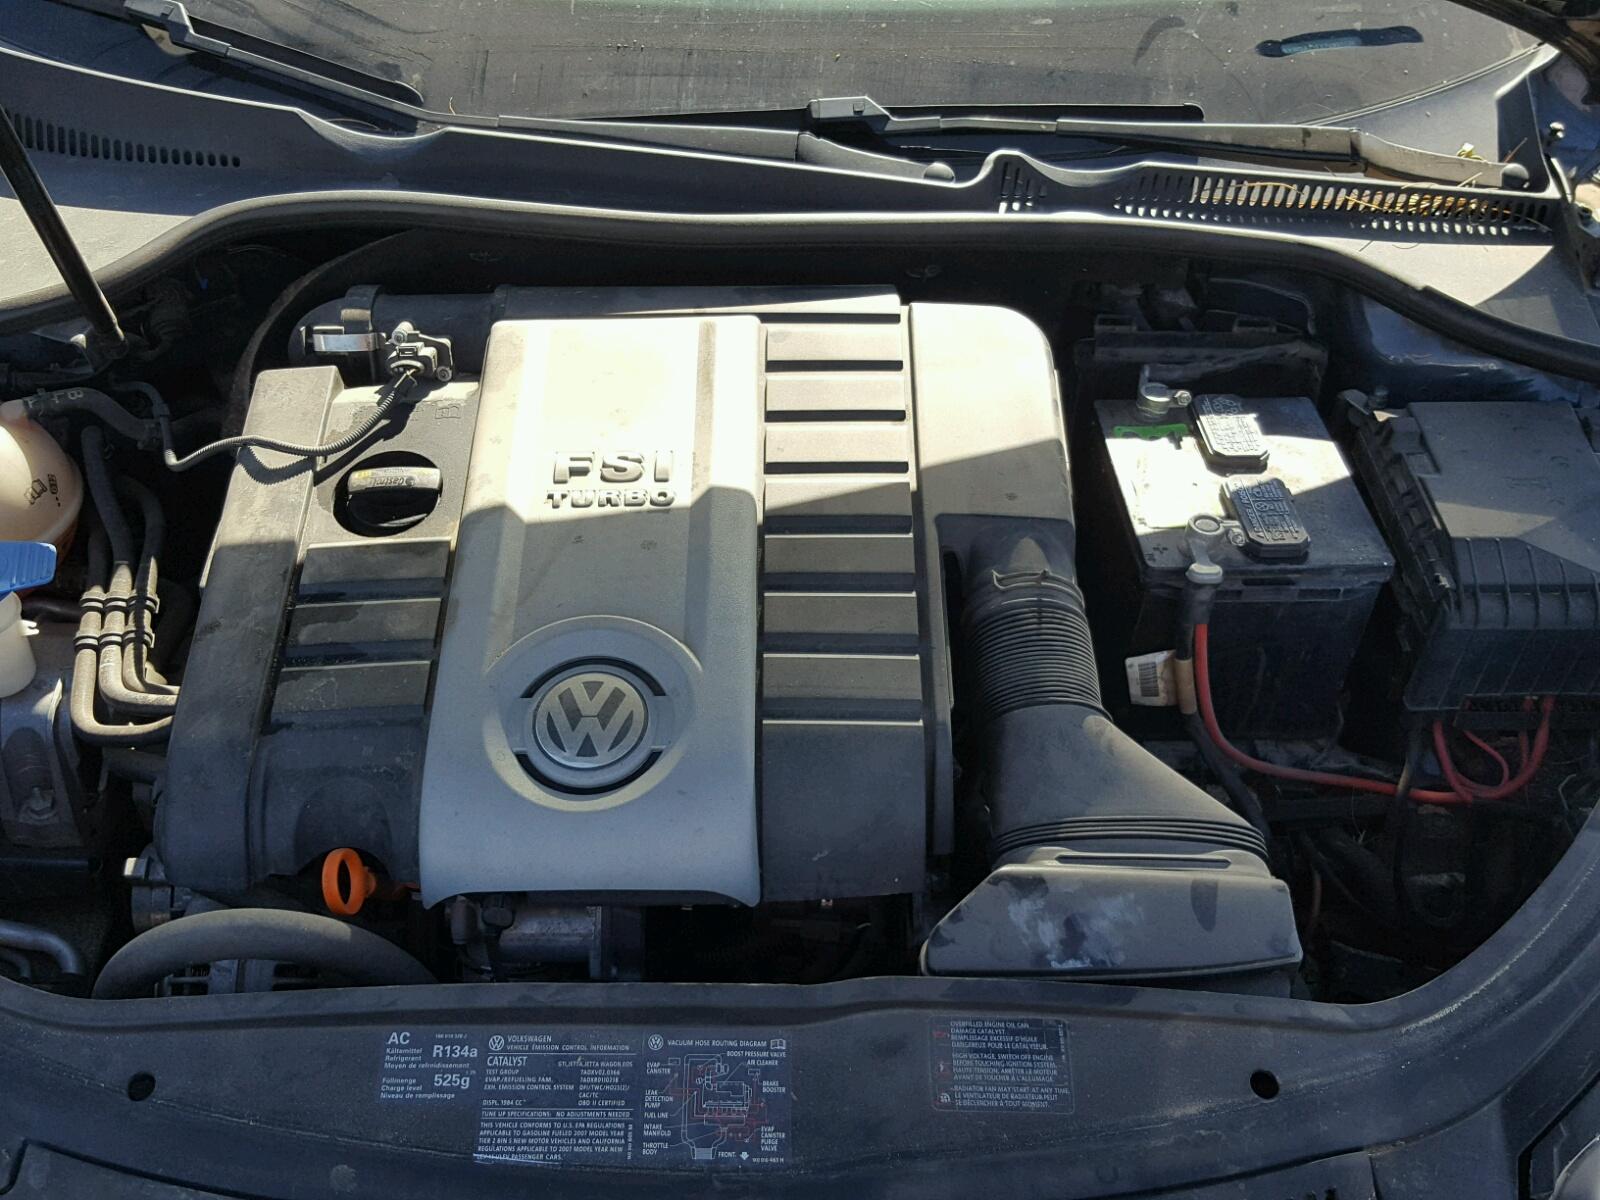 2007 Vw Eos Fuse Box Convertible Top Explained Wiring Diagrams Volkswagen Diagram Schematics Vacuum Pump